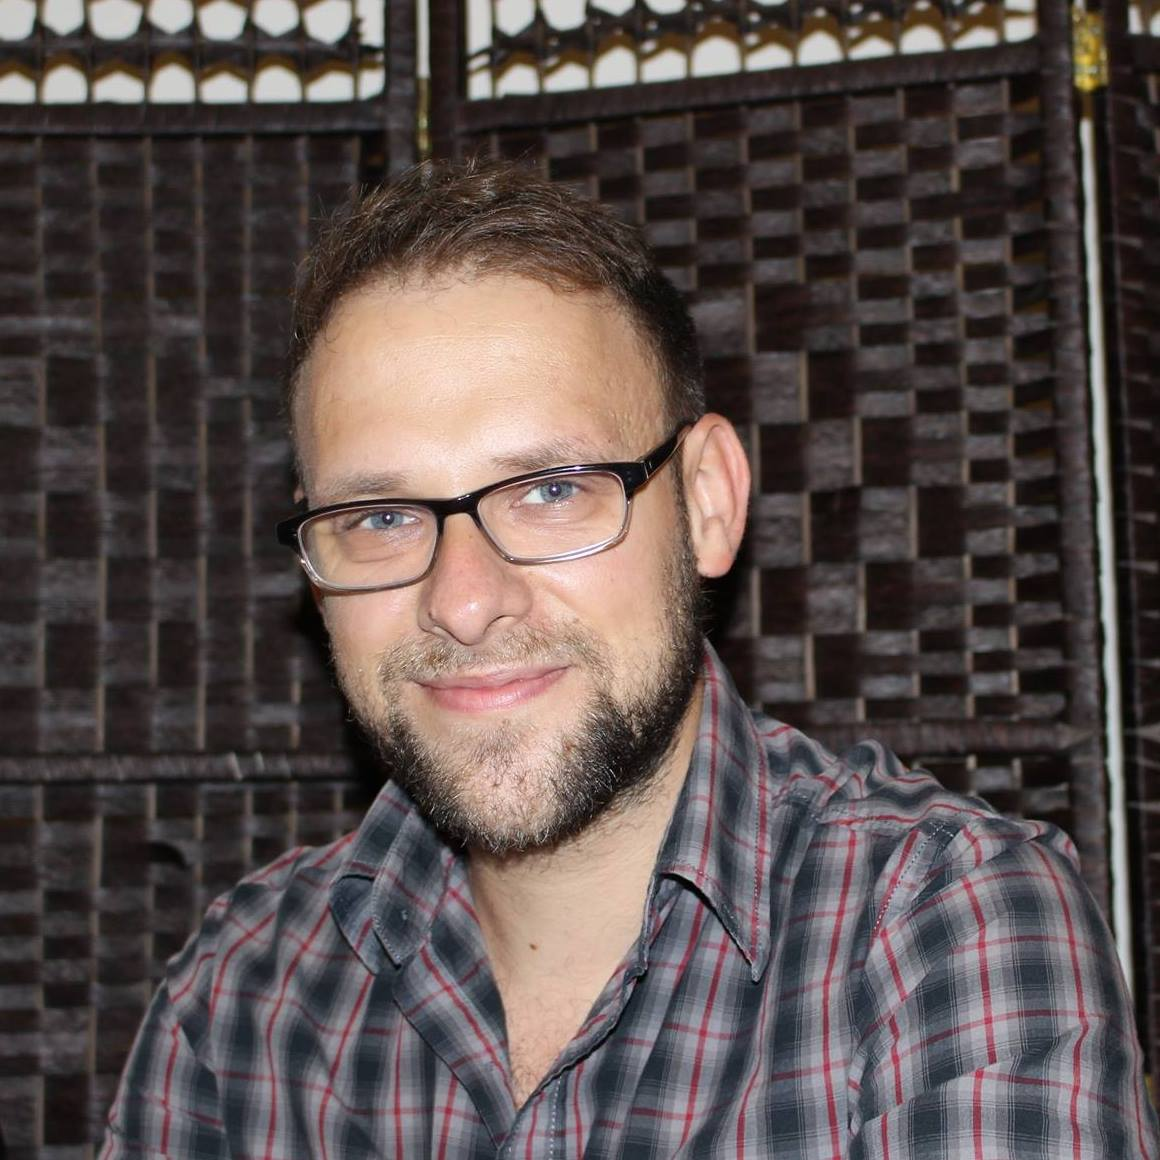 Image of Sergei Revzin, the Institute's newest Venture Associate.